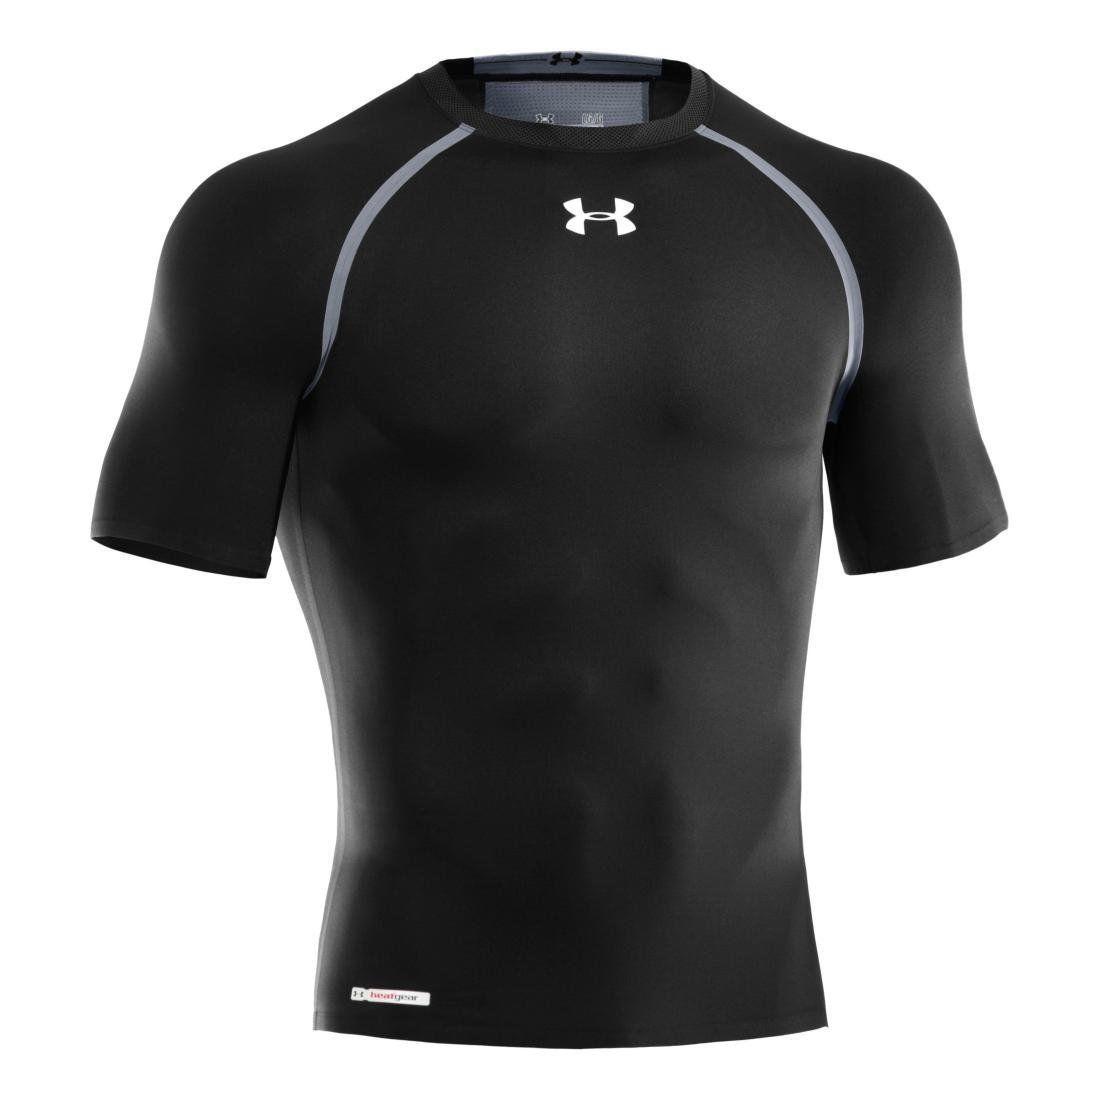 Under Armour DYNASTY Men's Black/Gray/White UA Compression Shirt -X-Large 10812